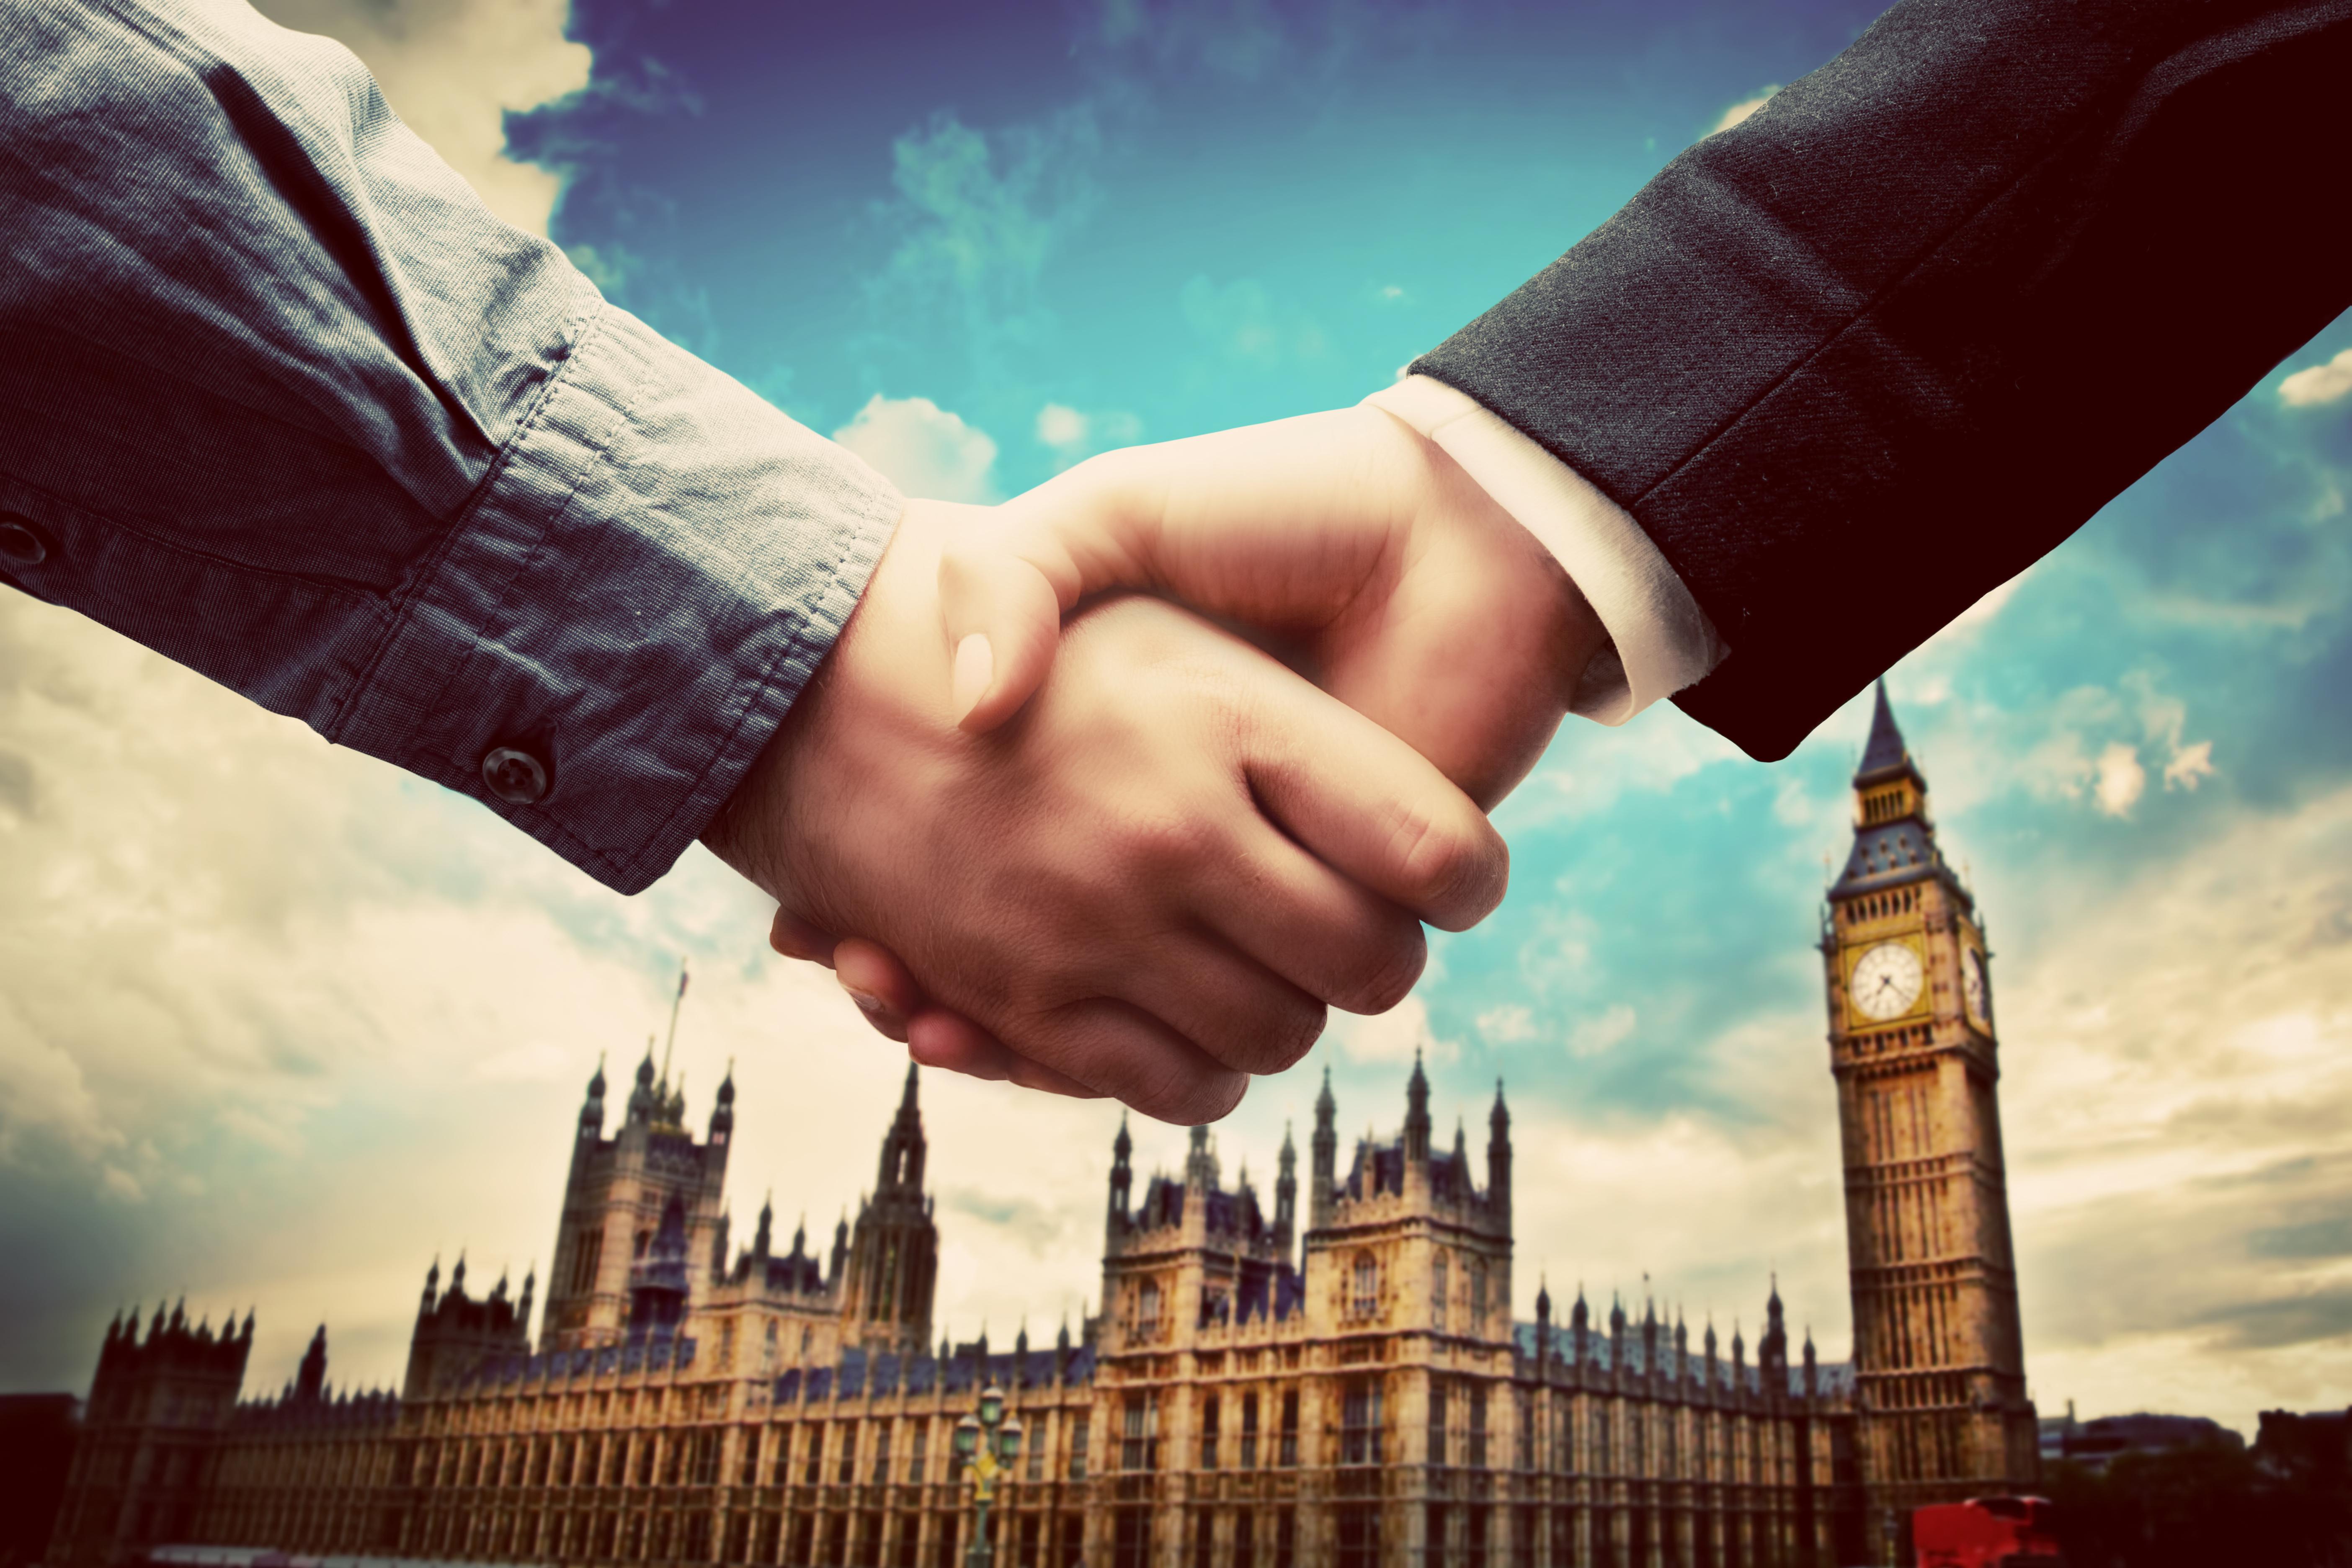 Рукопожатие на фоне Биг Бена в Англии, куда можно переехать по трудоустройству